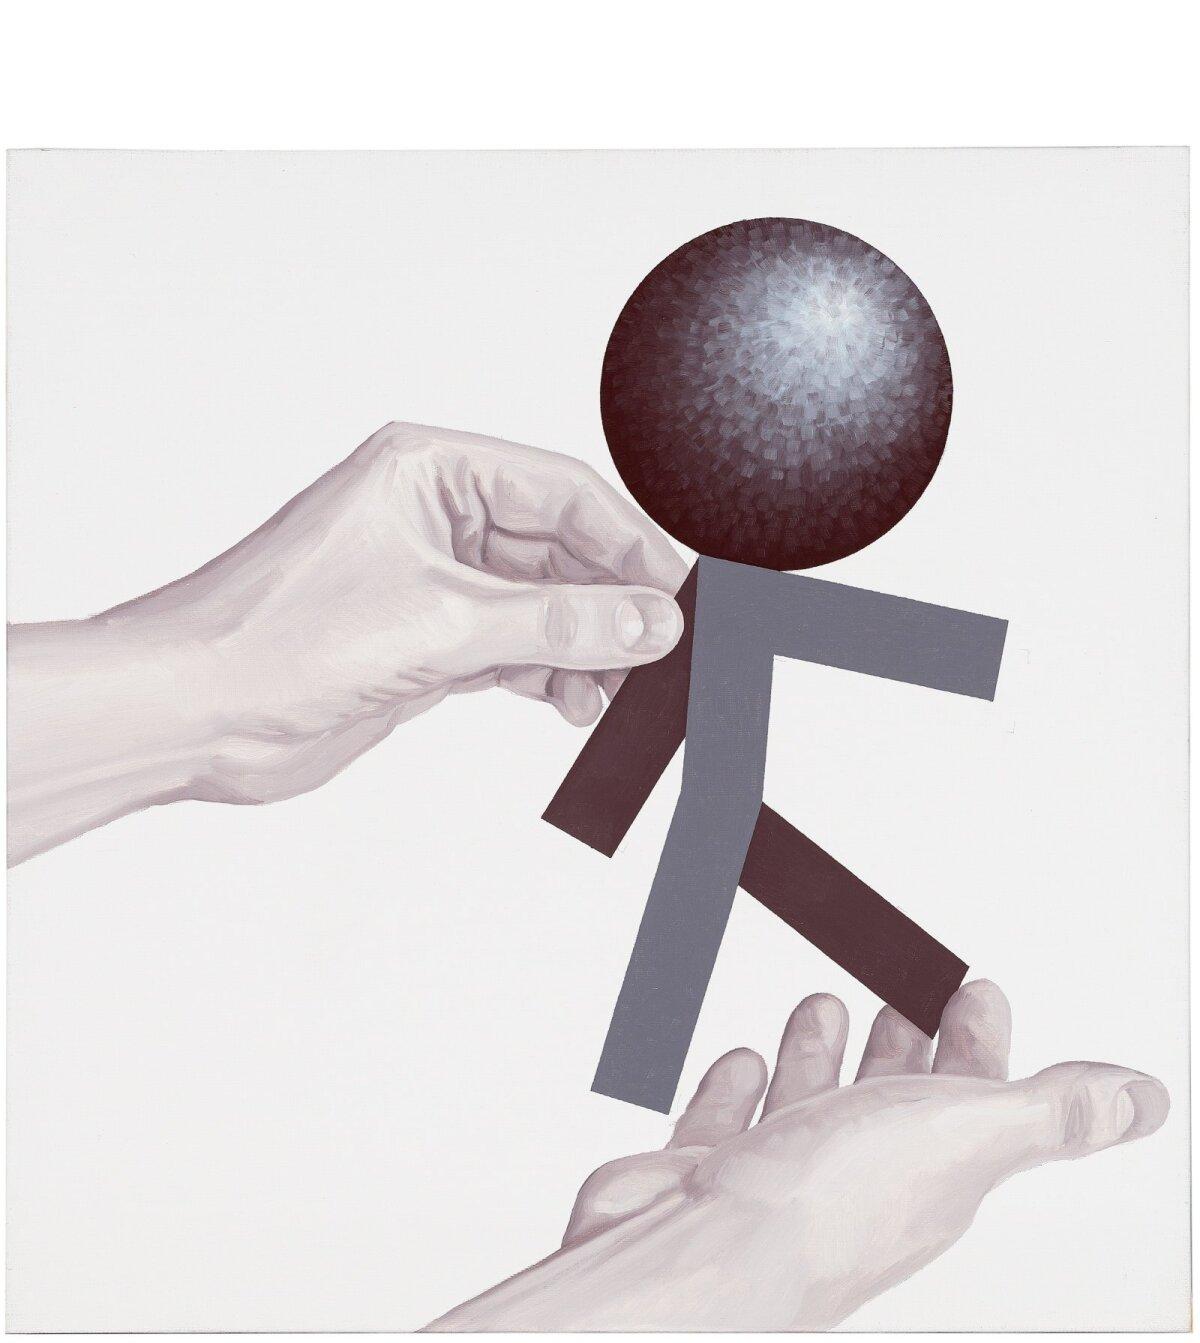 """Nimeta CXLVII"" (2000), Kaido Ole"